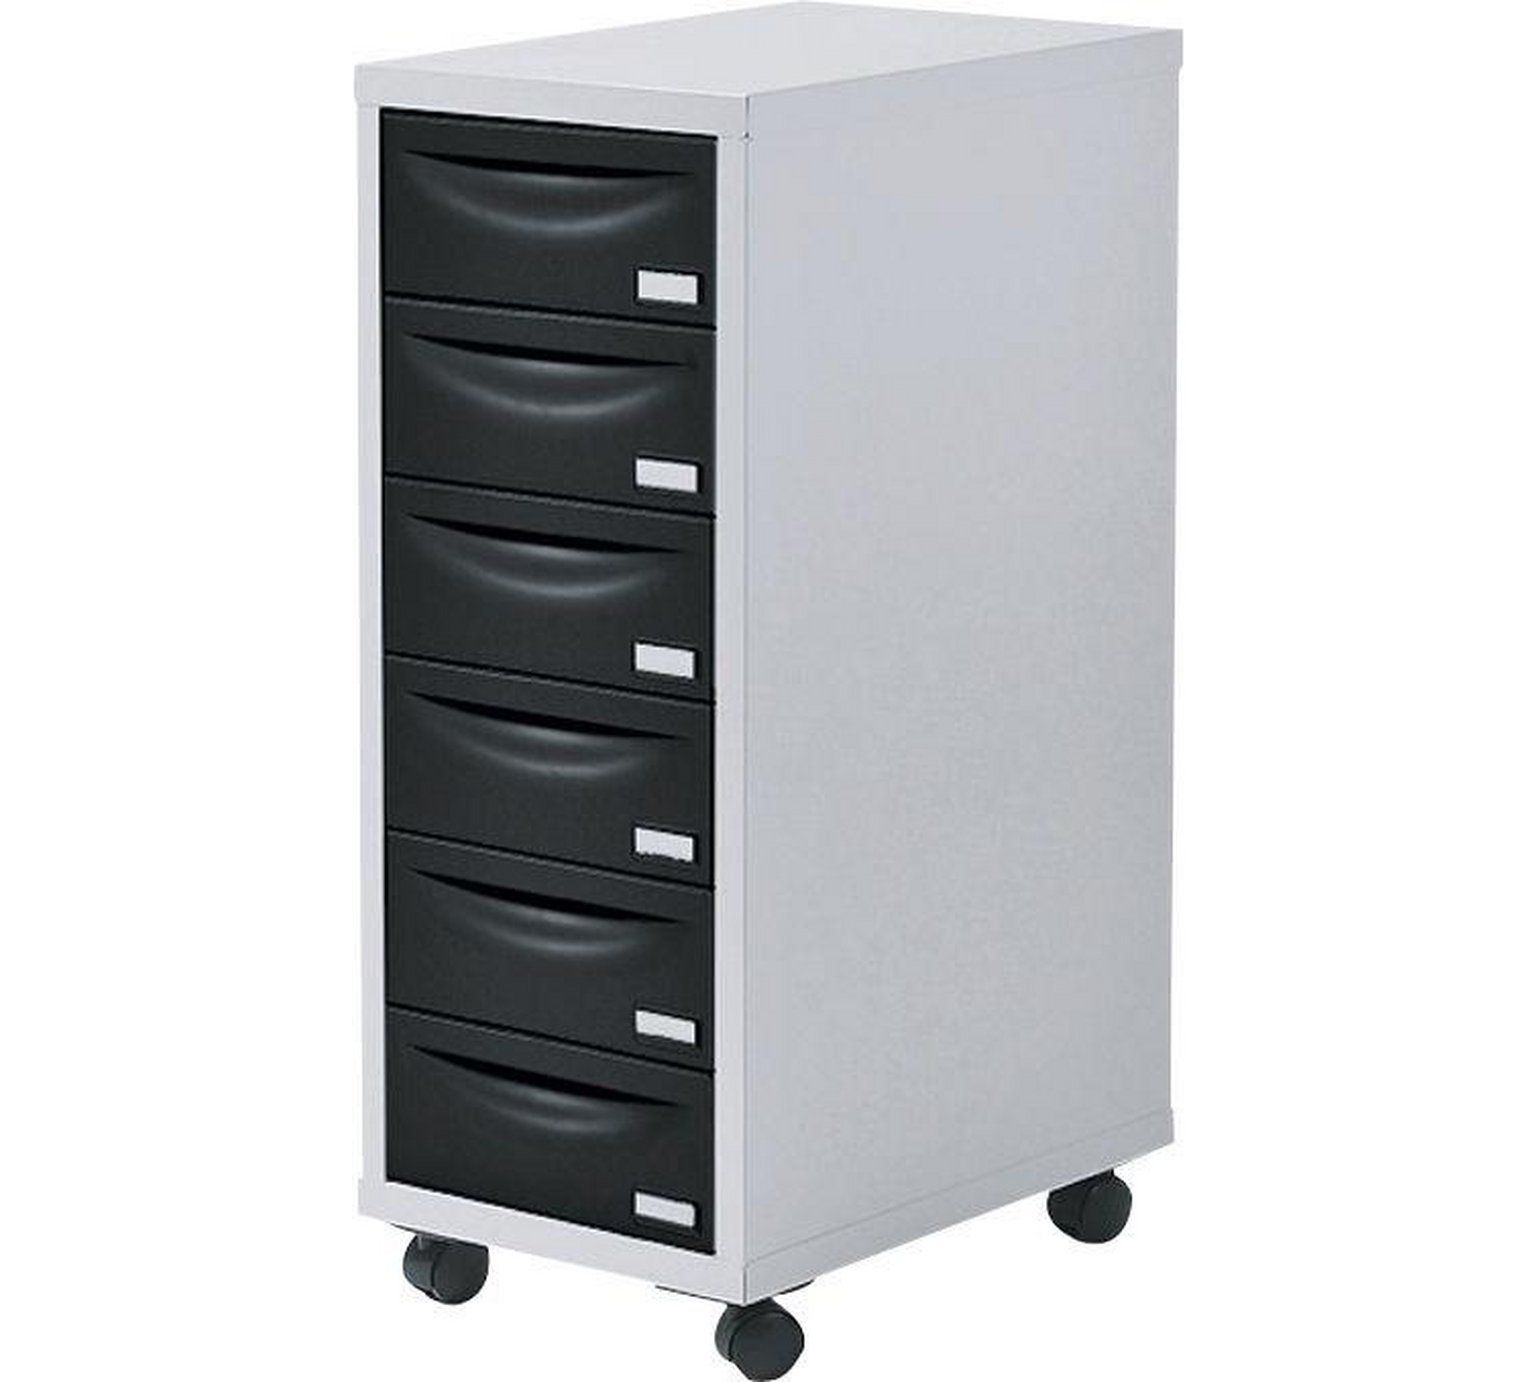 filing cabinets argos | www.cintronbeveragegroup.com